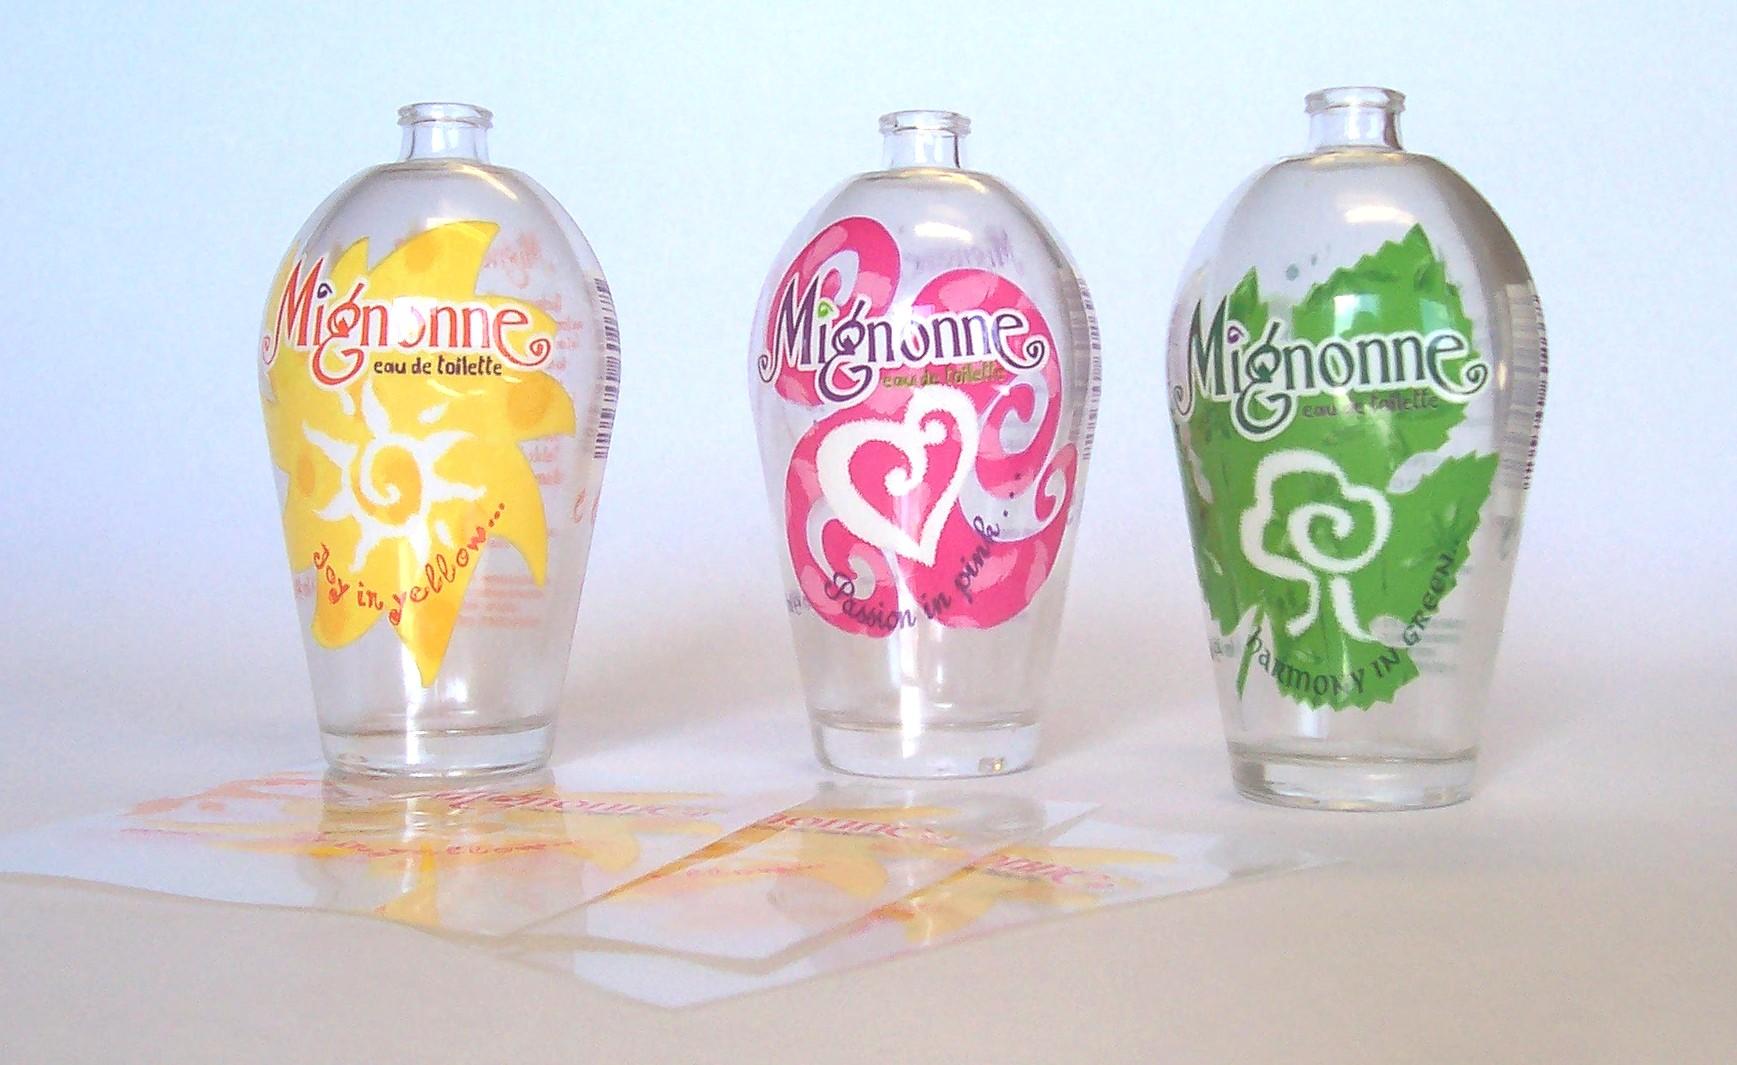 Parfum-Mignonne shrink sleving Celtheq